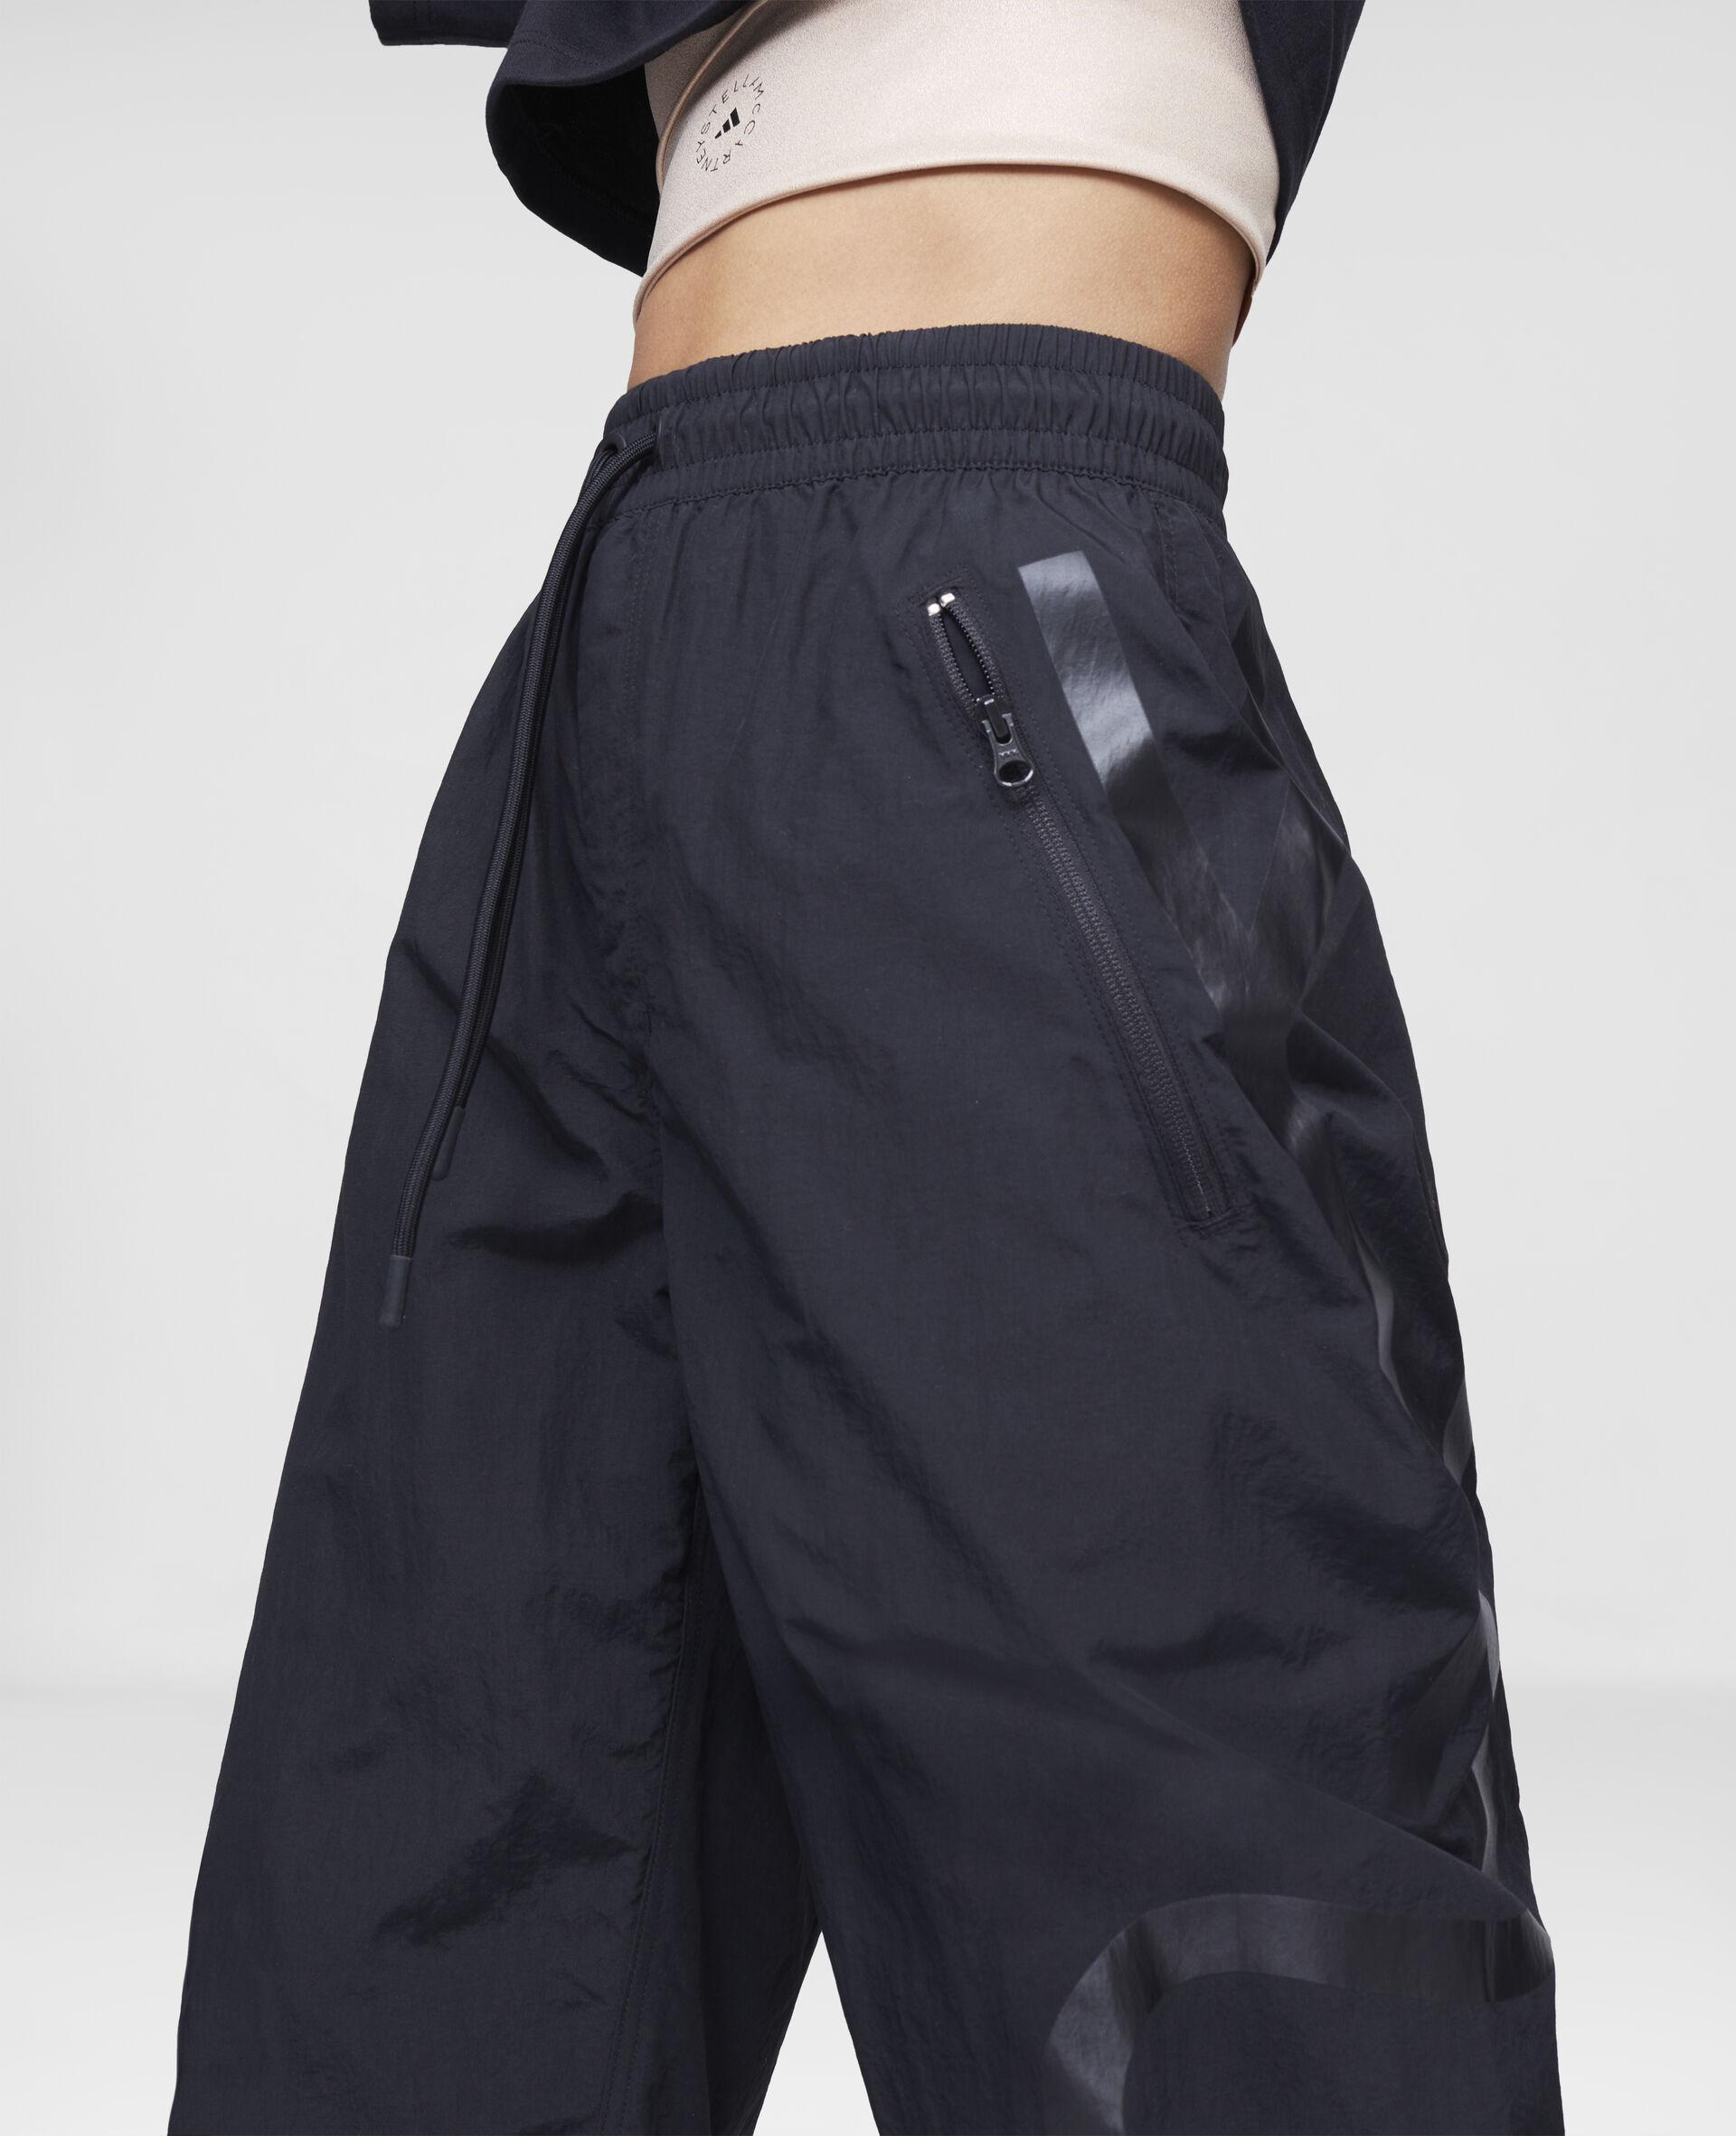 Pantaloni Training Neri Intrecciati-Nero-large image number 3